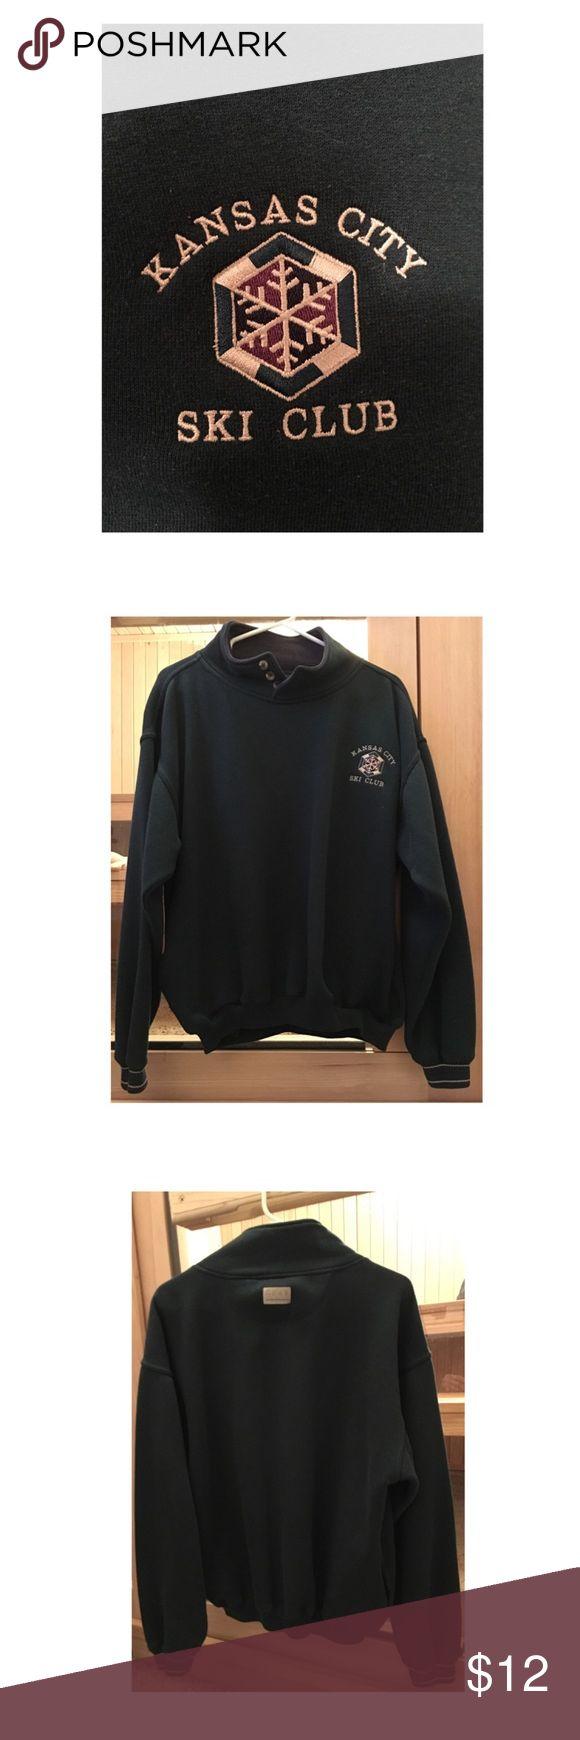 Kansas City Ski Club Sweatshirt Gear Kansas City Ski Club Sweatshirt in Loden Green with navy accents, Size Medium, 65% Polyester/35% Cotton, Excellent Condition Gear For Sports Other